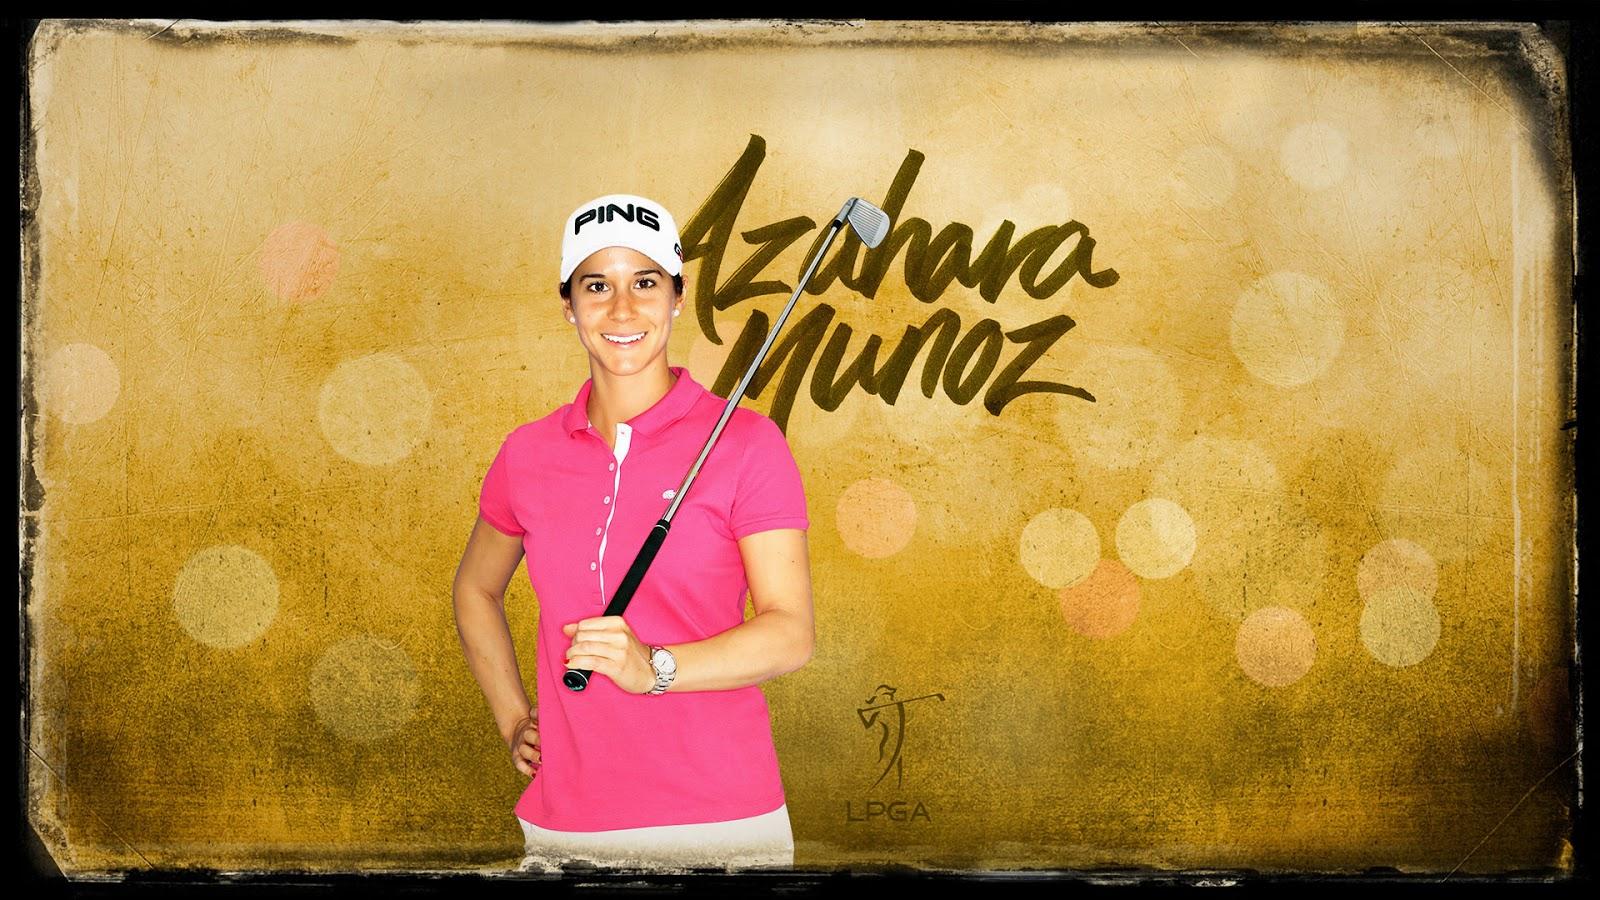 Azahara-Munoz-LPGA-Wallpaper-2014